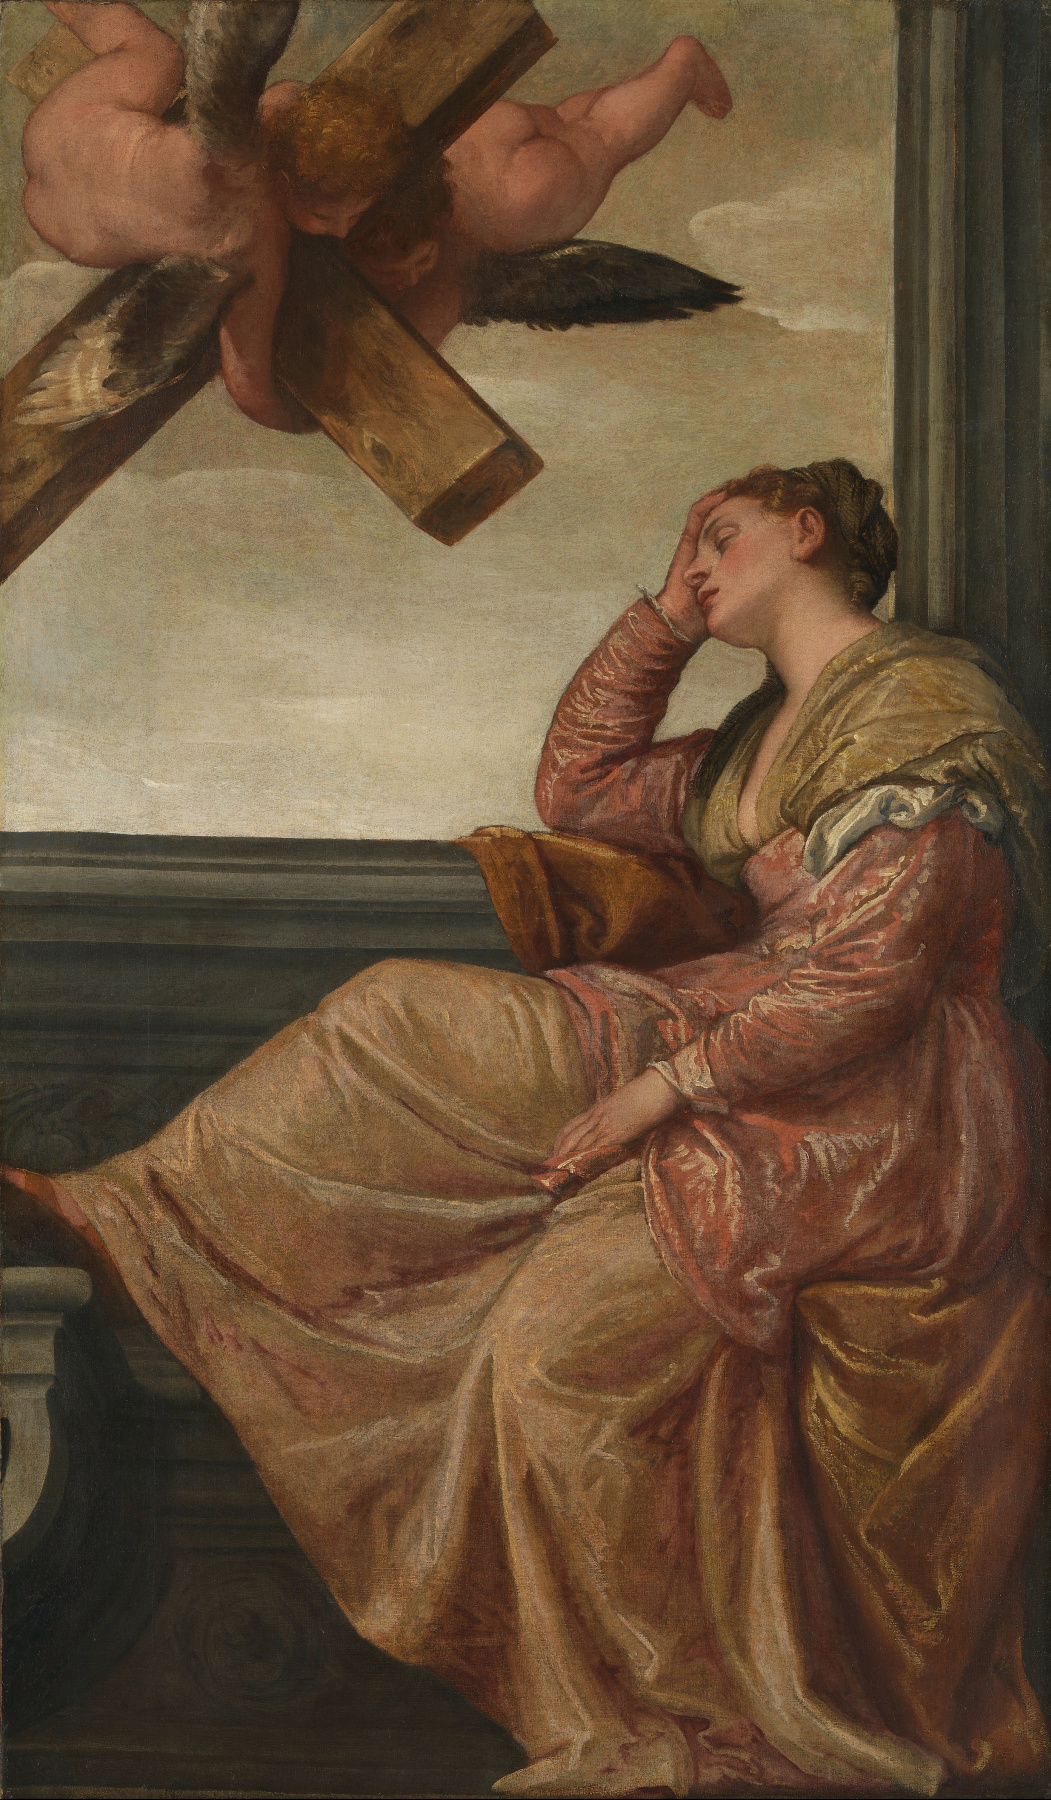 Paolo Veronese. Sleep of saint helena